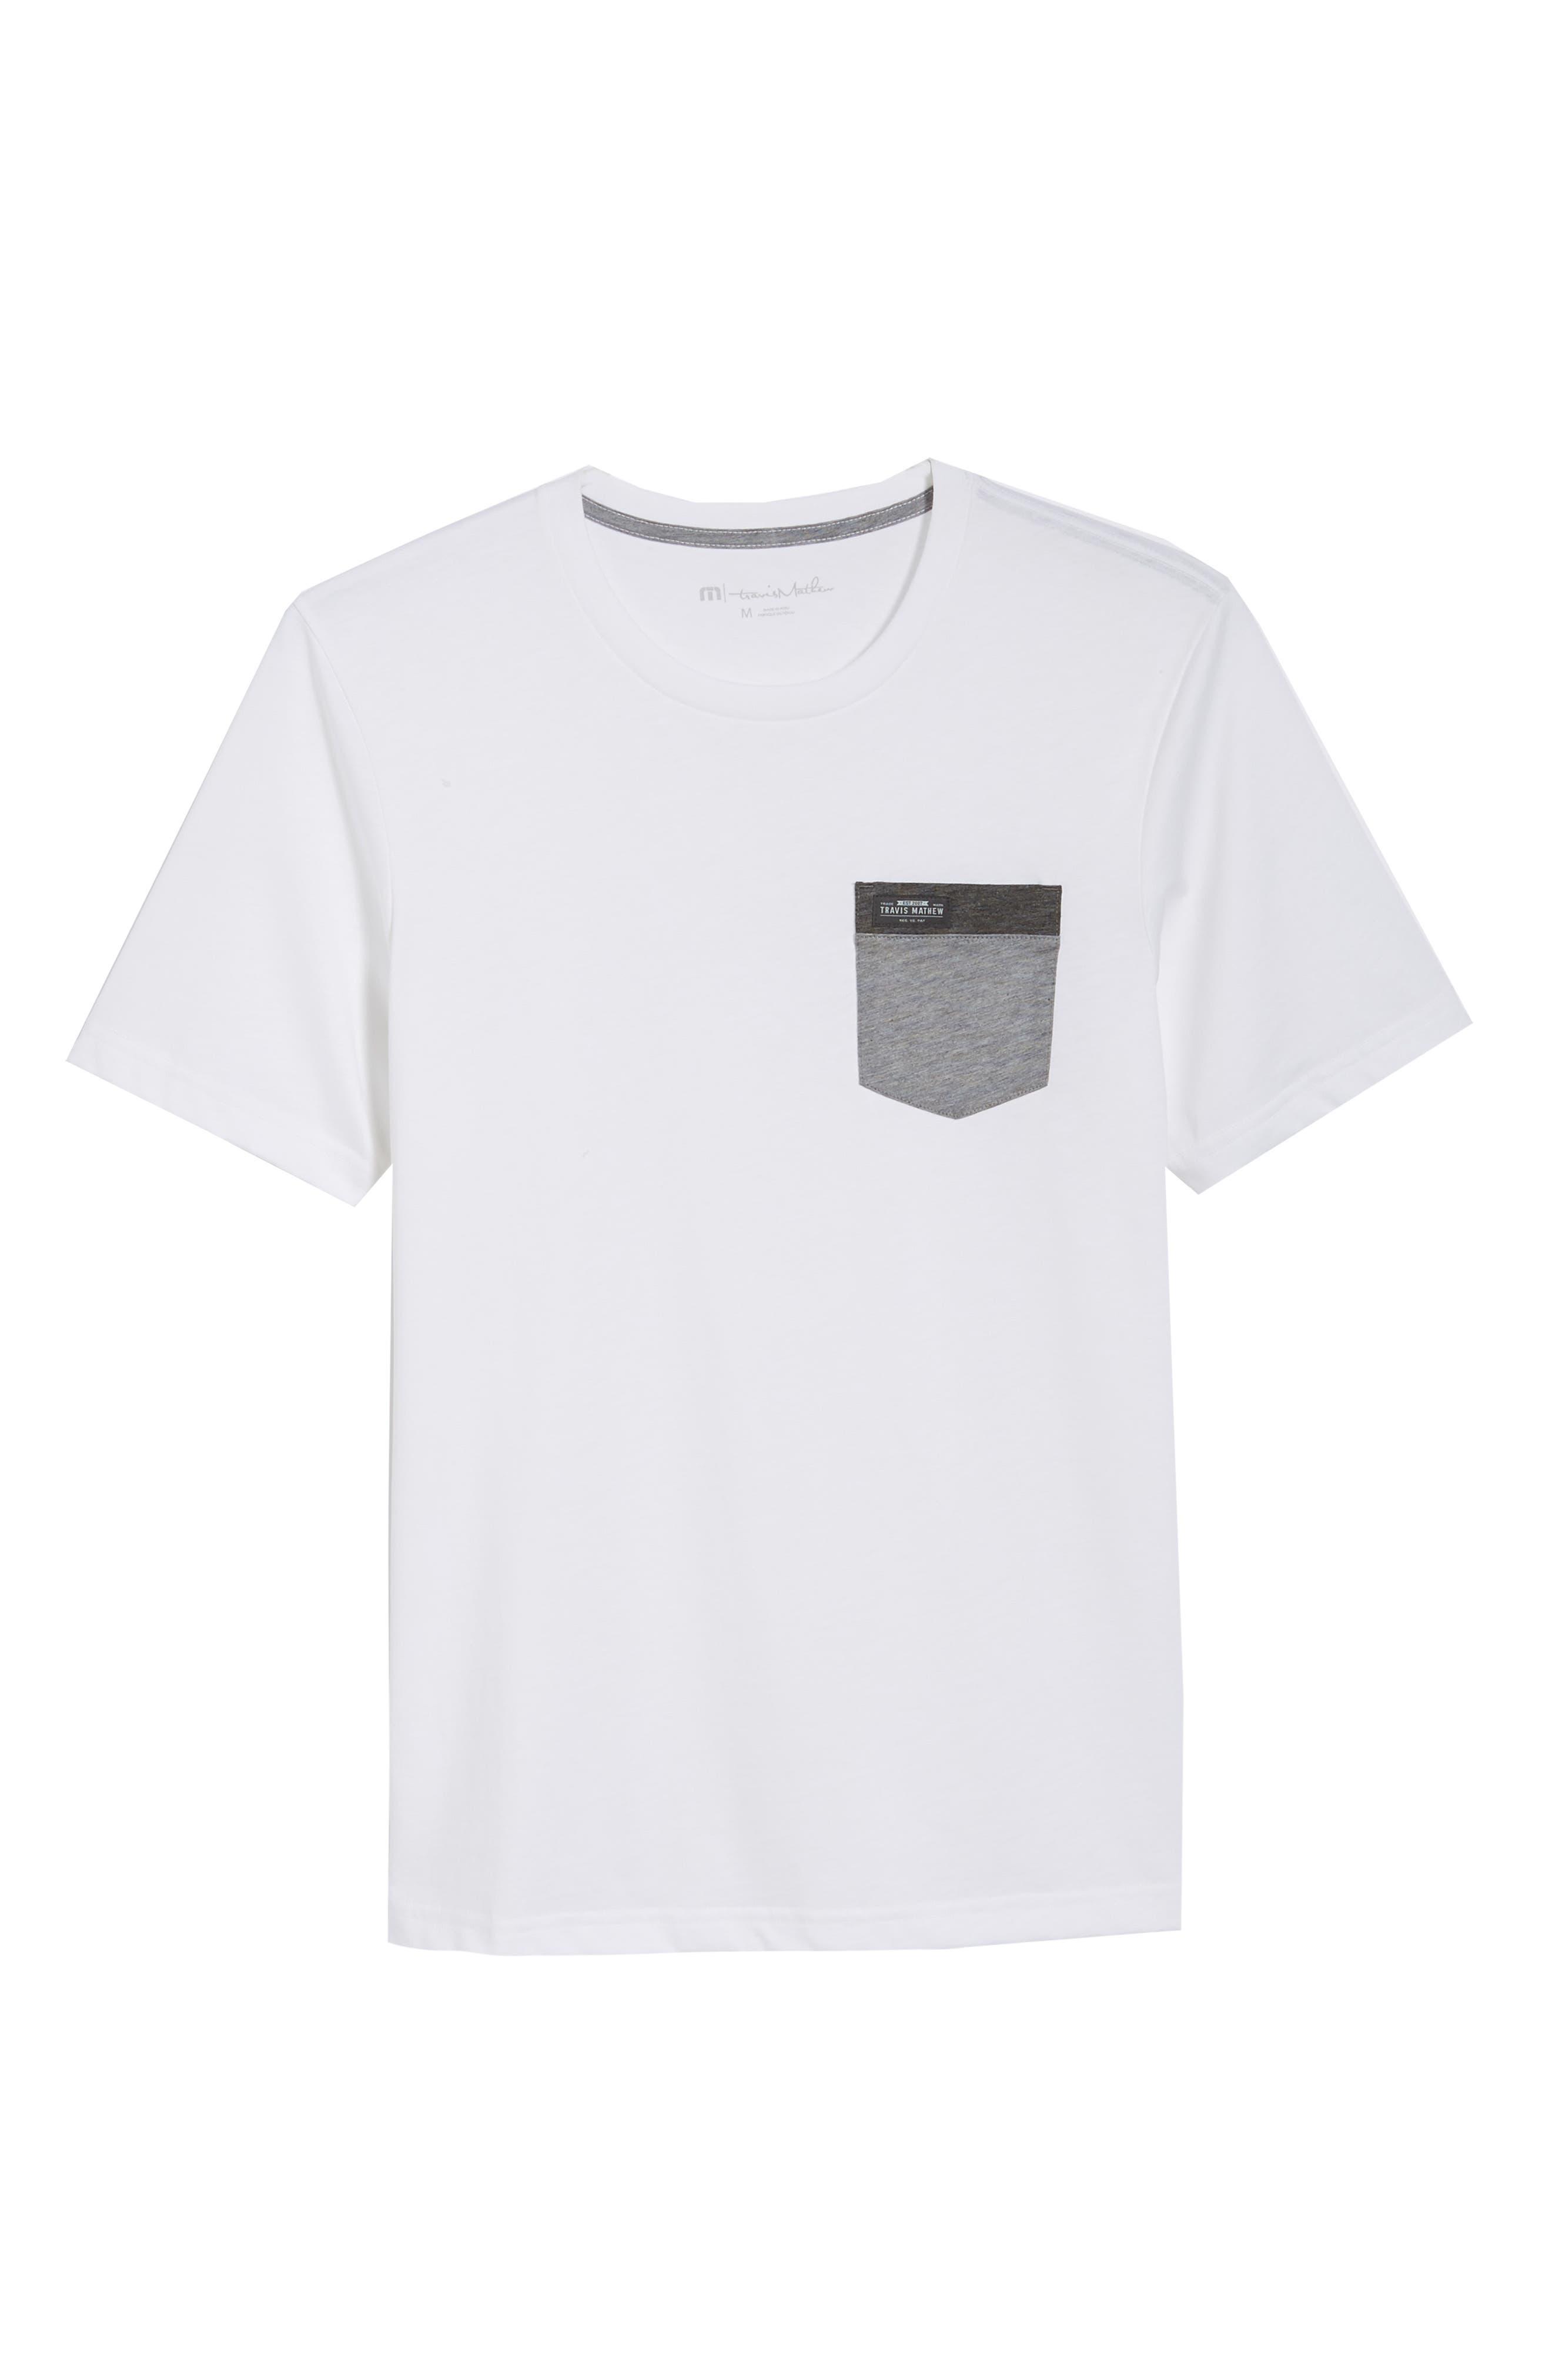 Muska Pocket T-Shirt,                             Alternate thumbnail 6, color,                             100